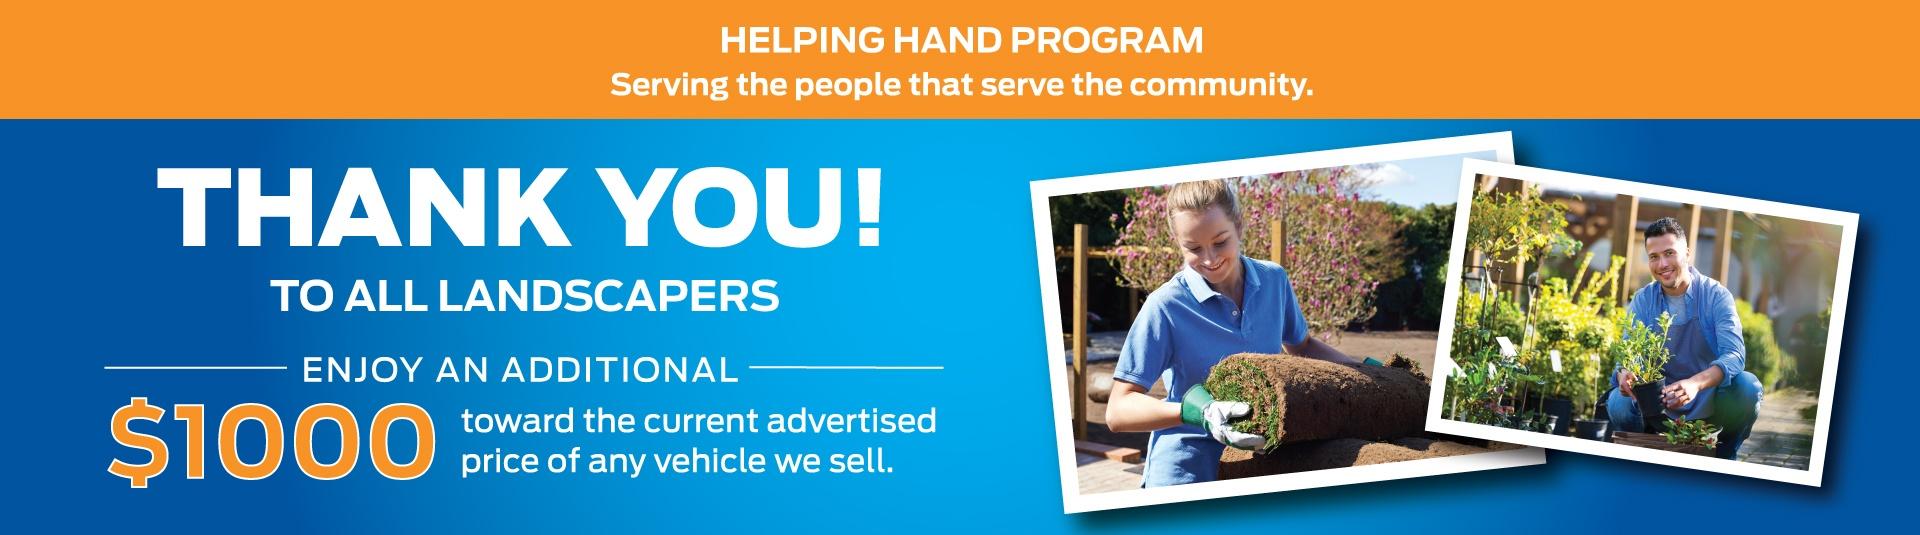 helping-hand-program